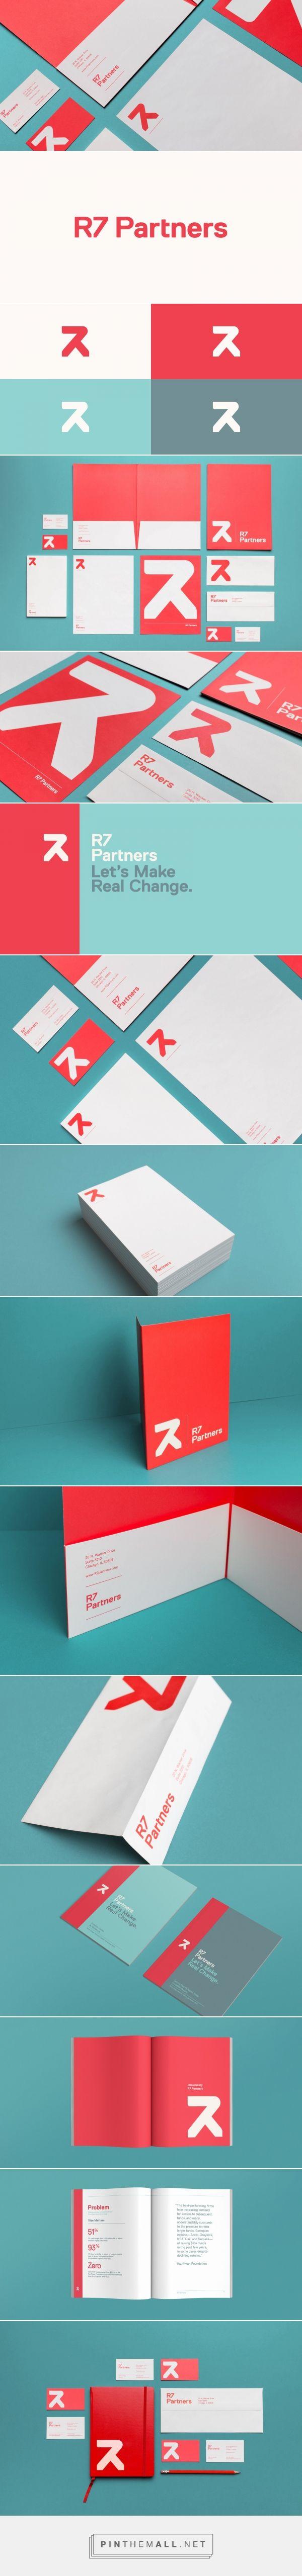 R7 Partners Branding by Mast | Fivestar Branding – Design and Branding Agency & Inspiration Gallery